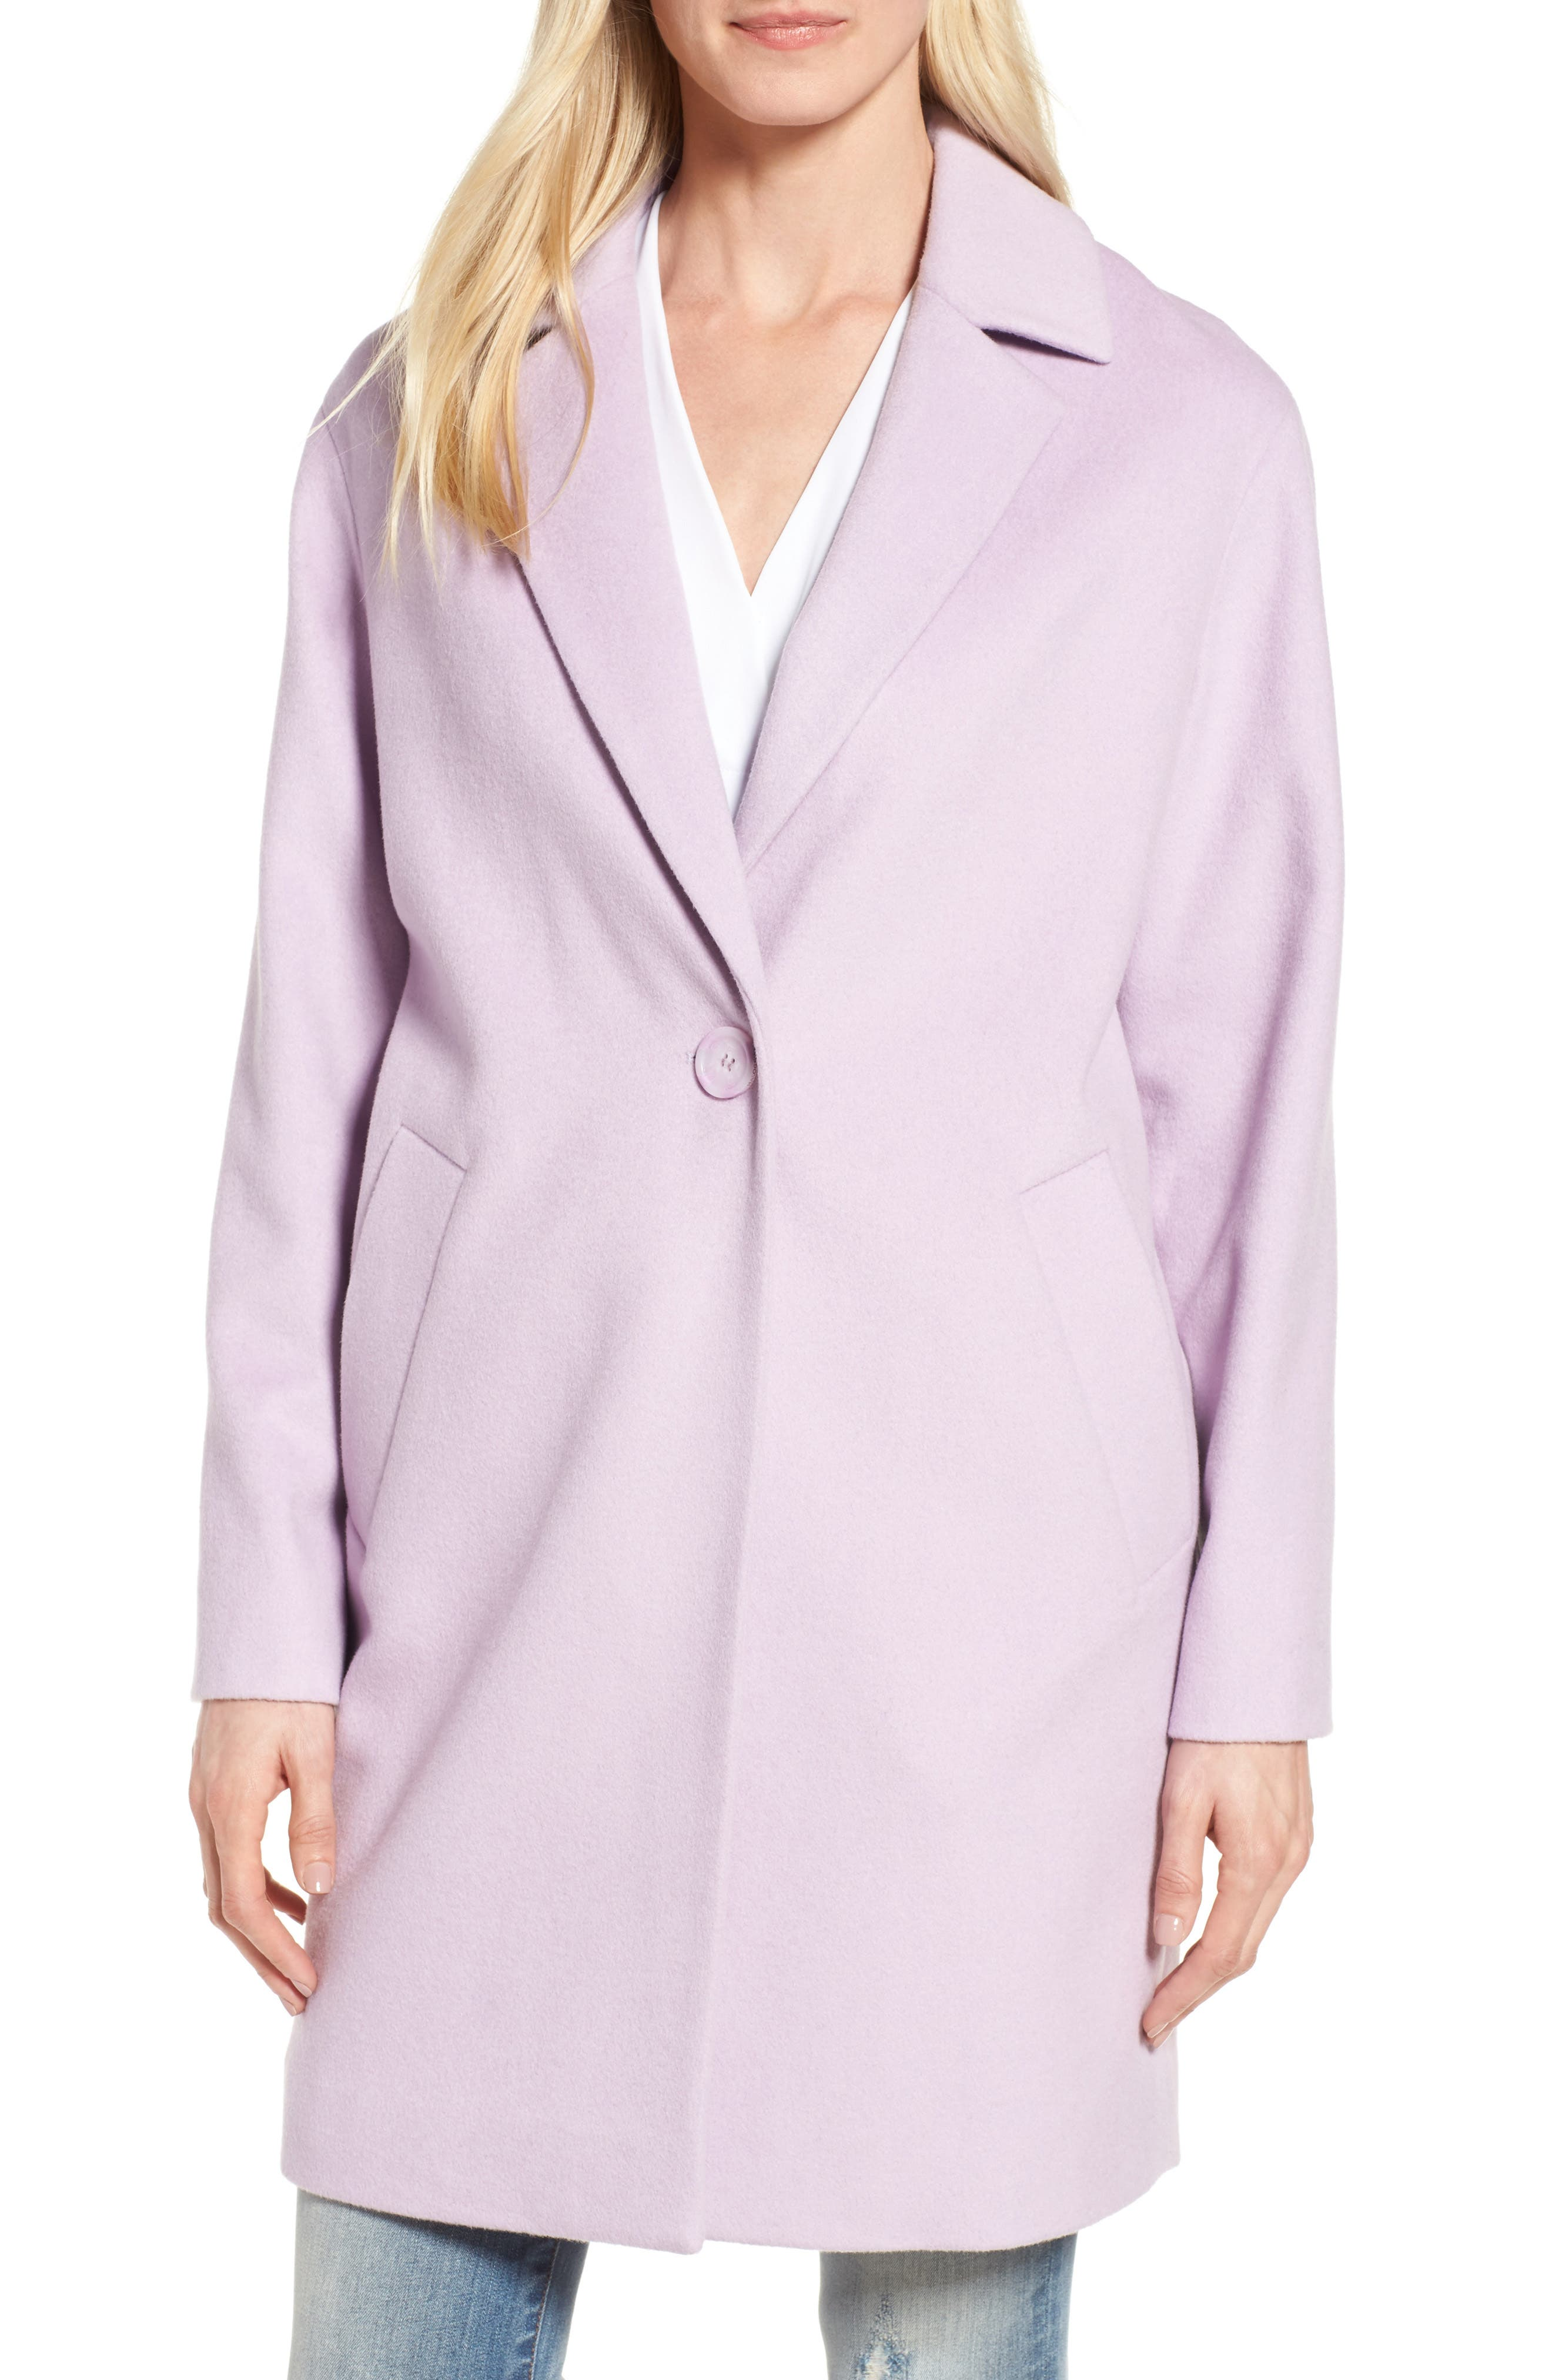 Wool Blend Coat,                         Main,                         color, Icy Lavendar